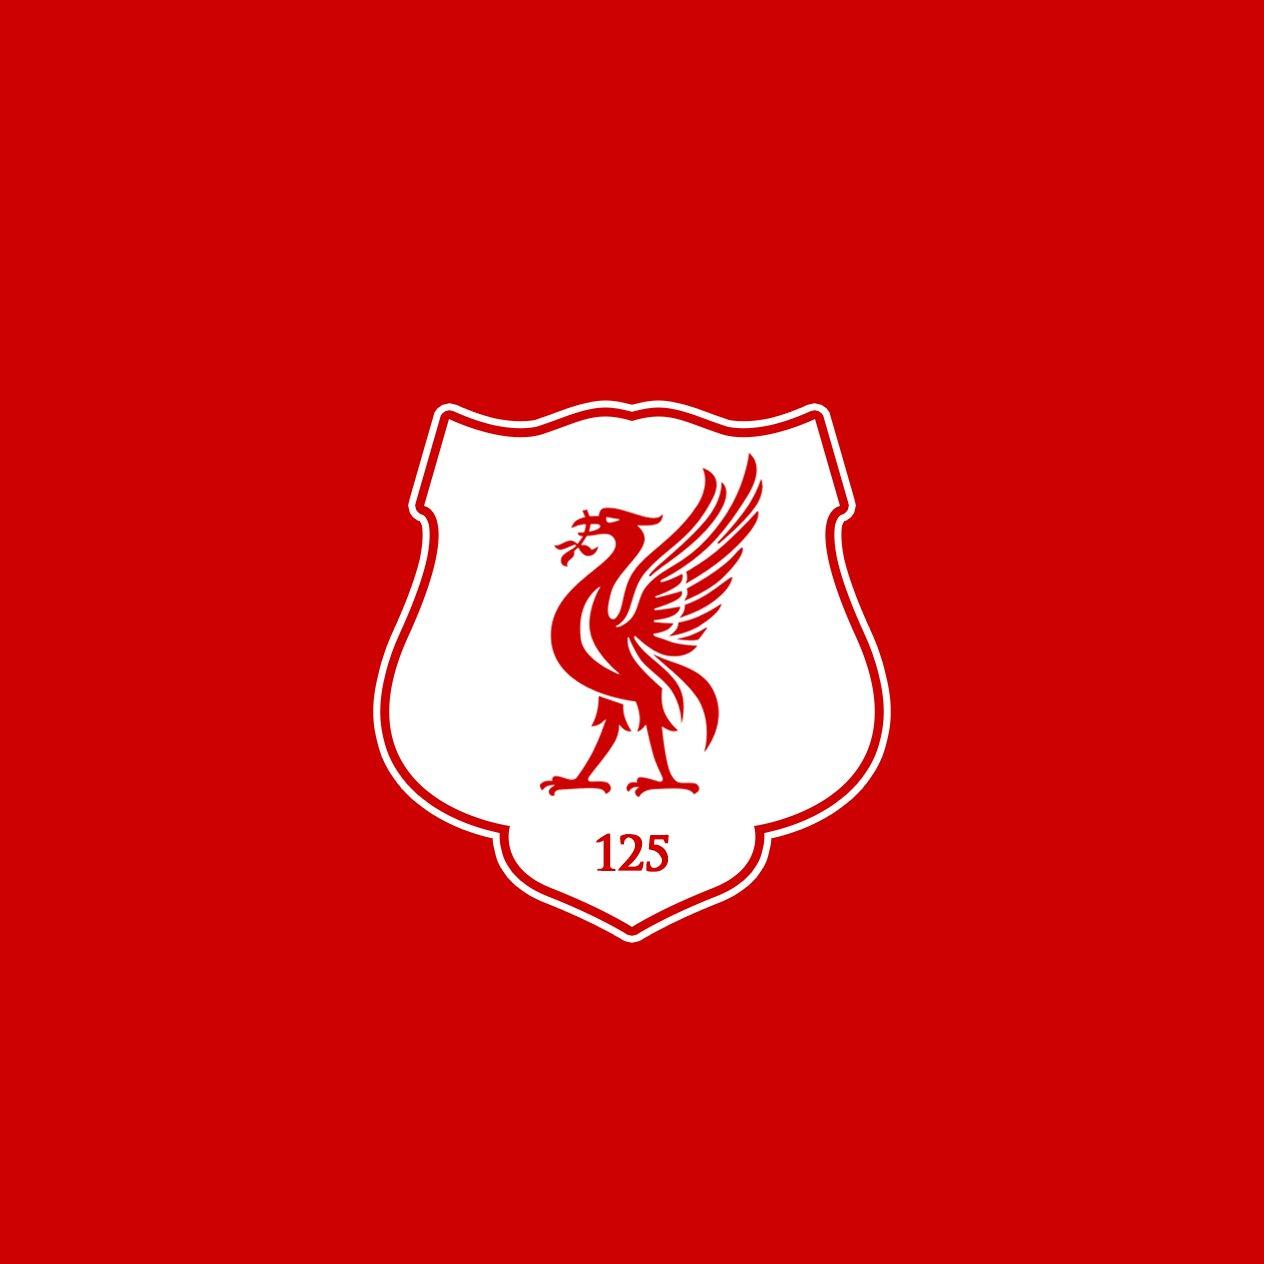 "Luke Walsh on Twitter: ""#LFC 125 year anniversary kit and ..."